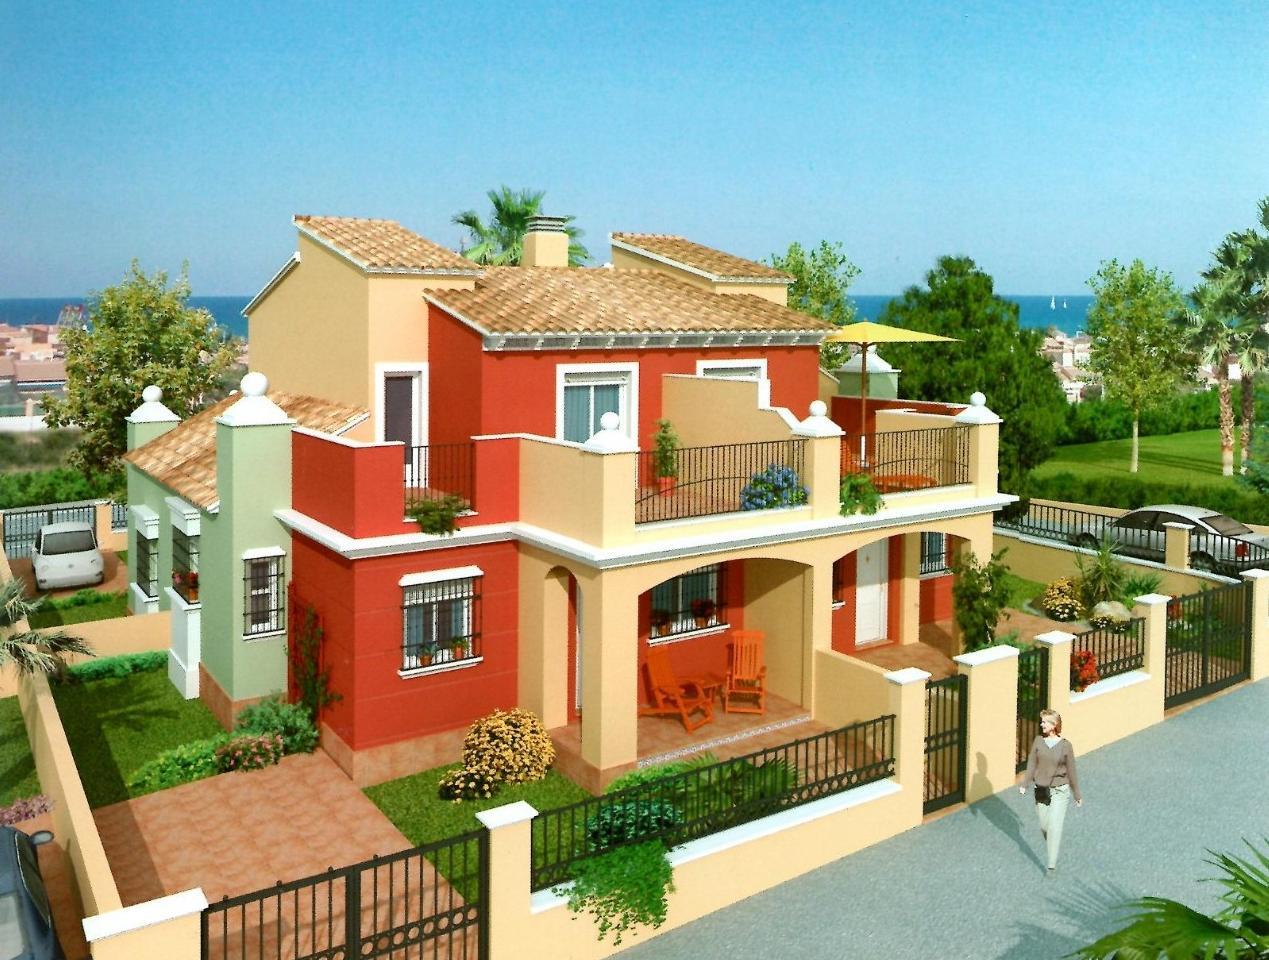 inmobiliaria casa alicante: